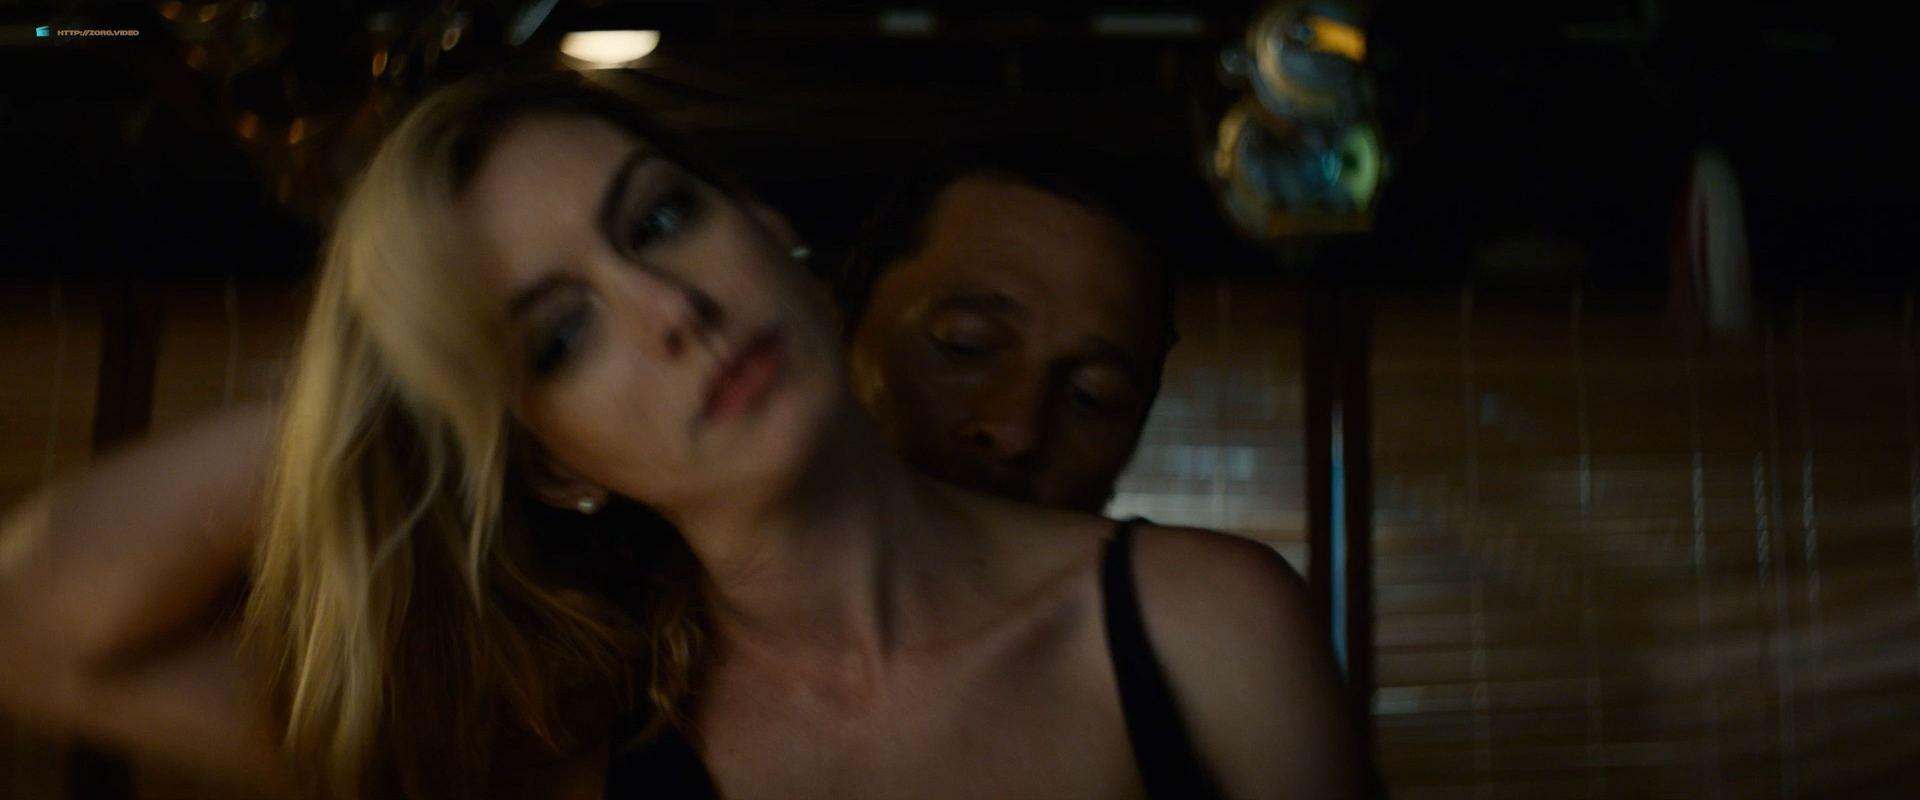 0201153347964_09_Anne-Hathaway-hot-in-sex-scene-Serenity-2019-HD-1080p-BluRay-00008.jpg